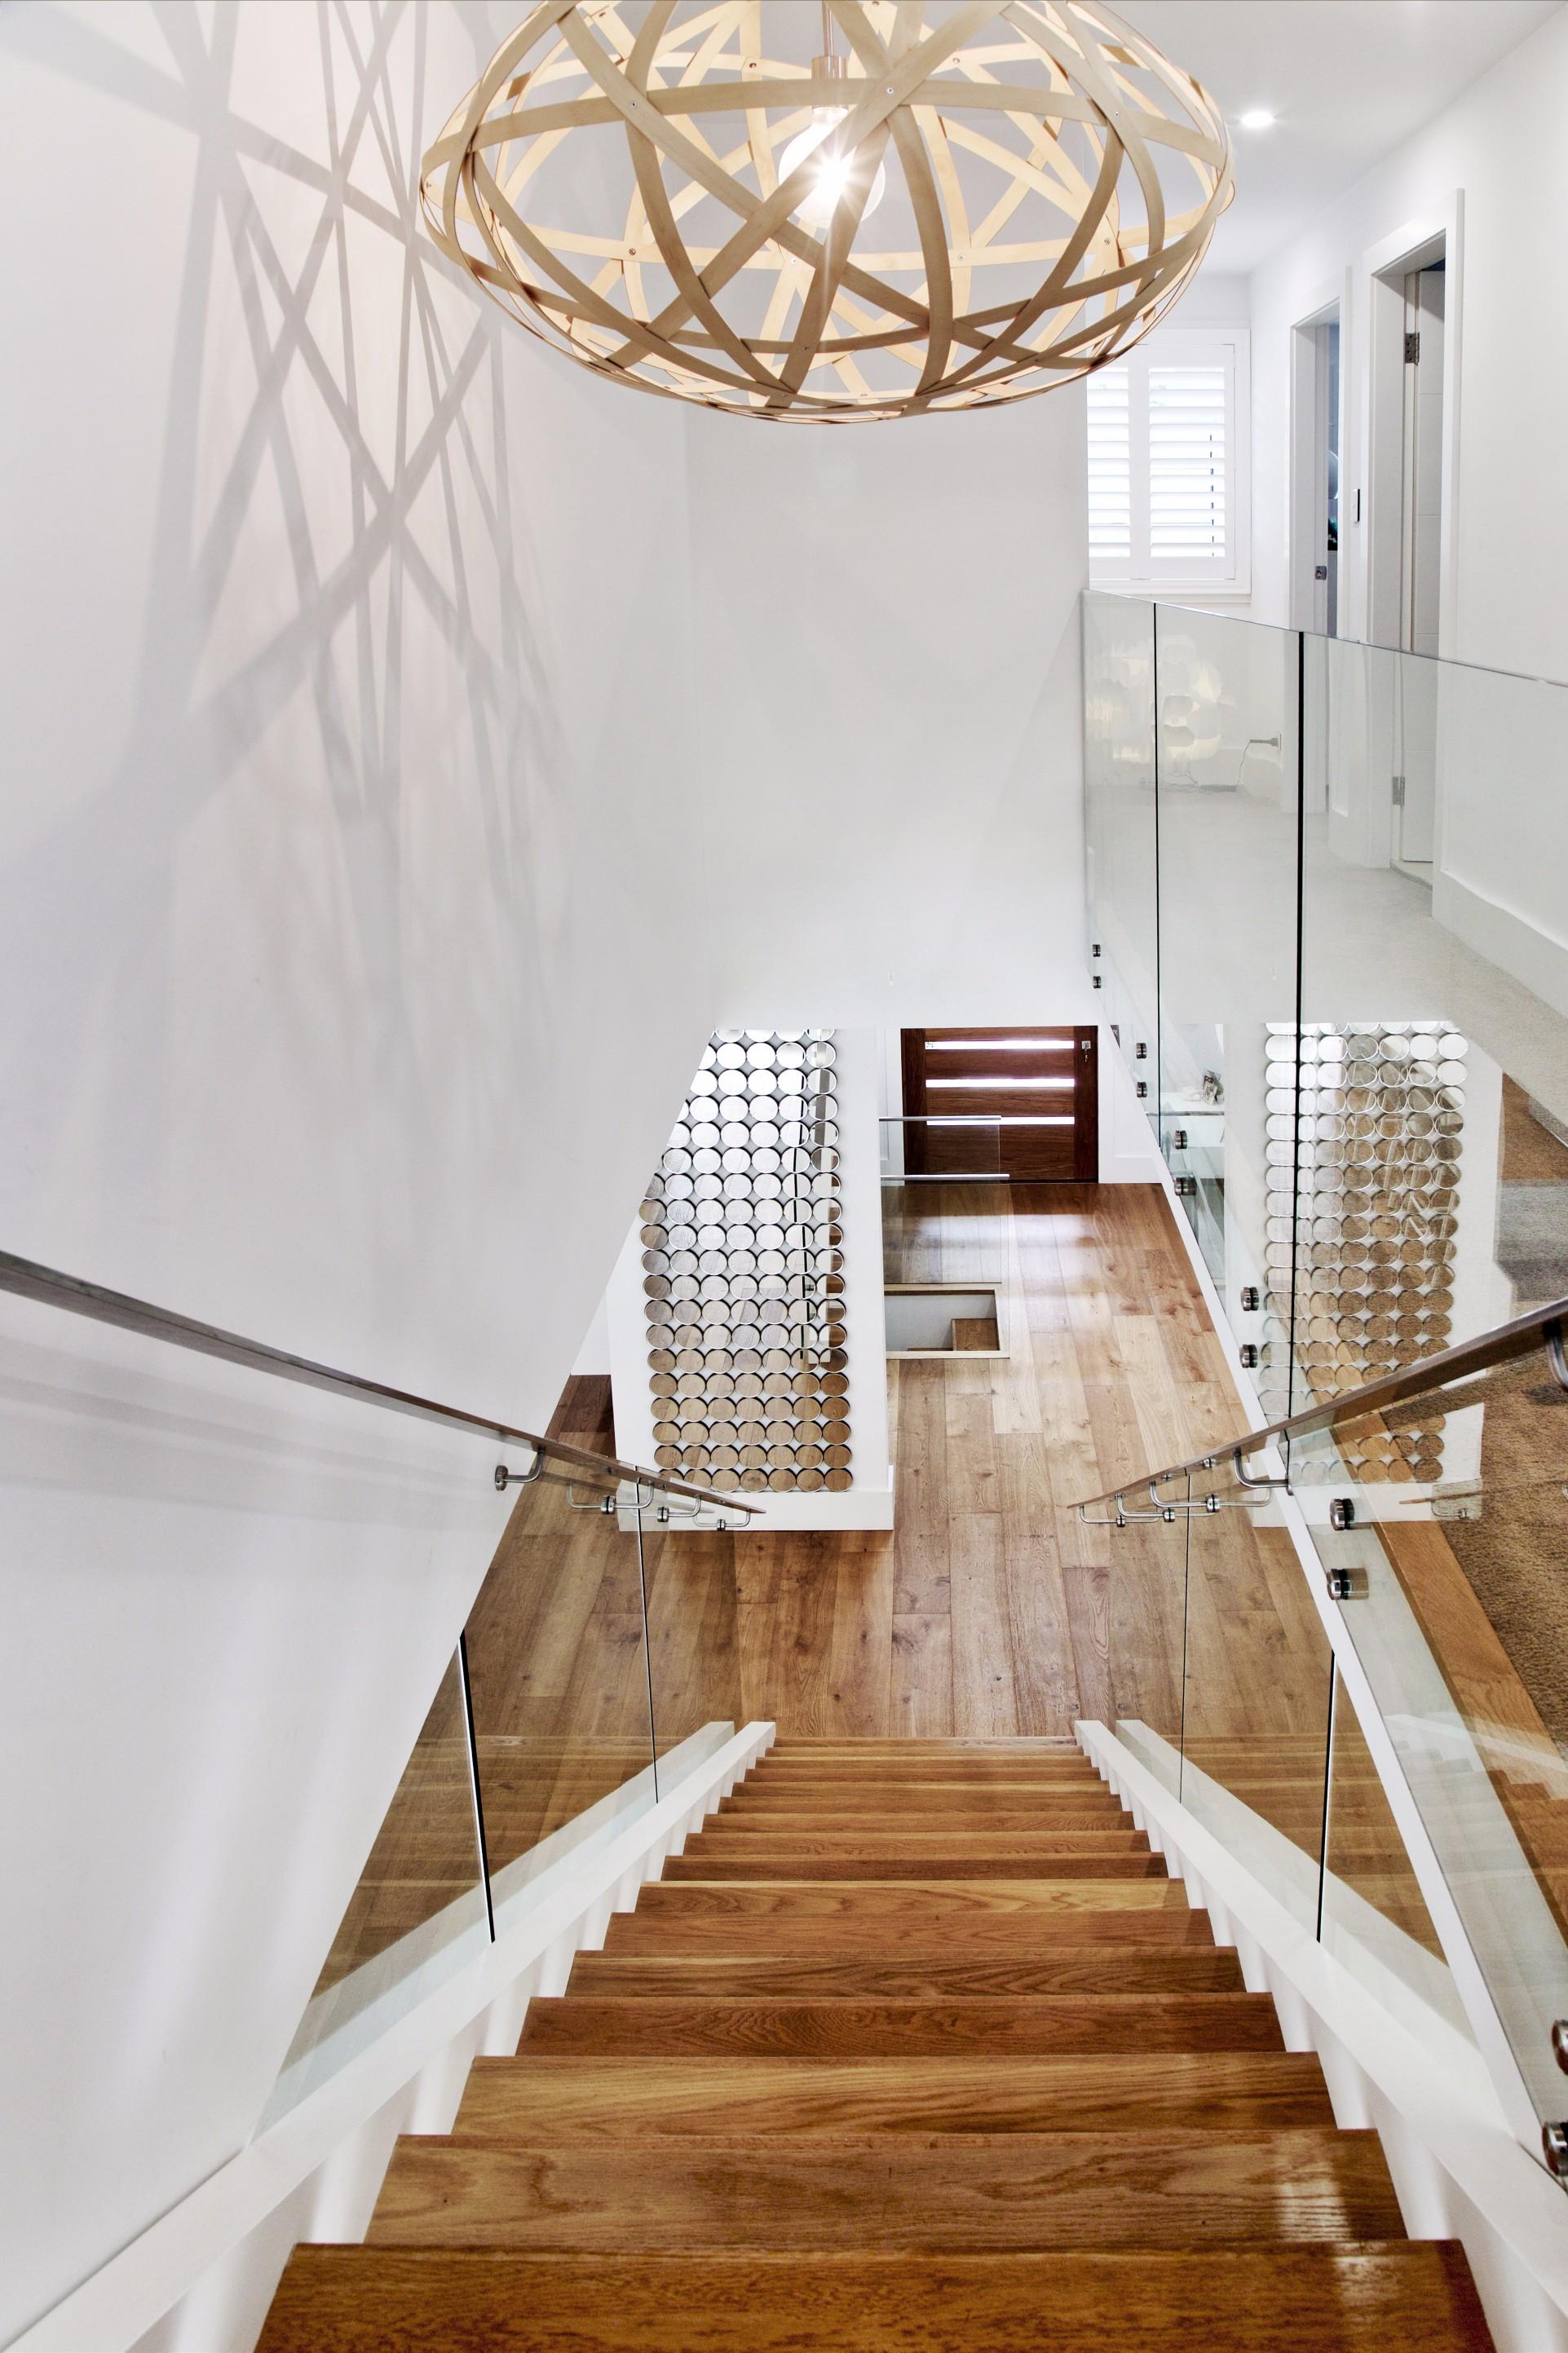 Nvisage_Custom_Design_Homes_Alterations_Additions_Casa_Pymble6.jpg